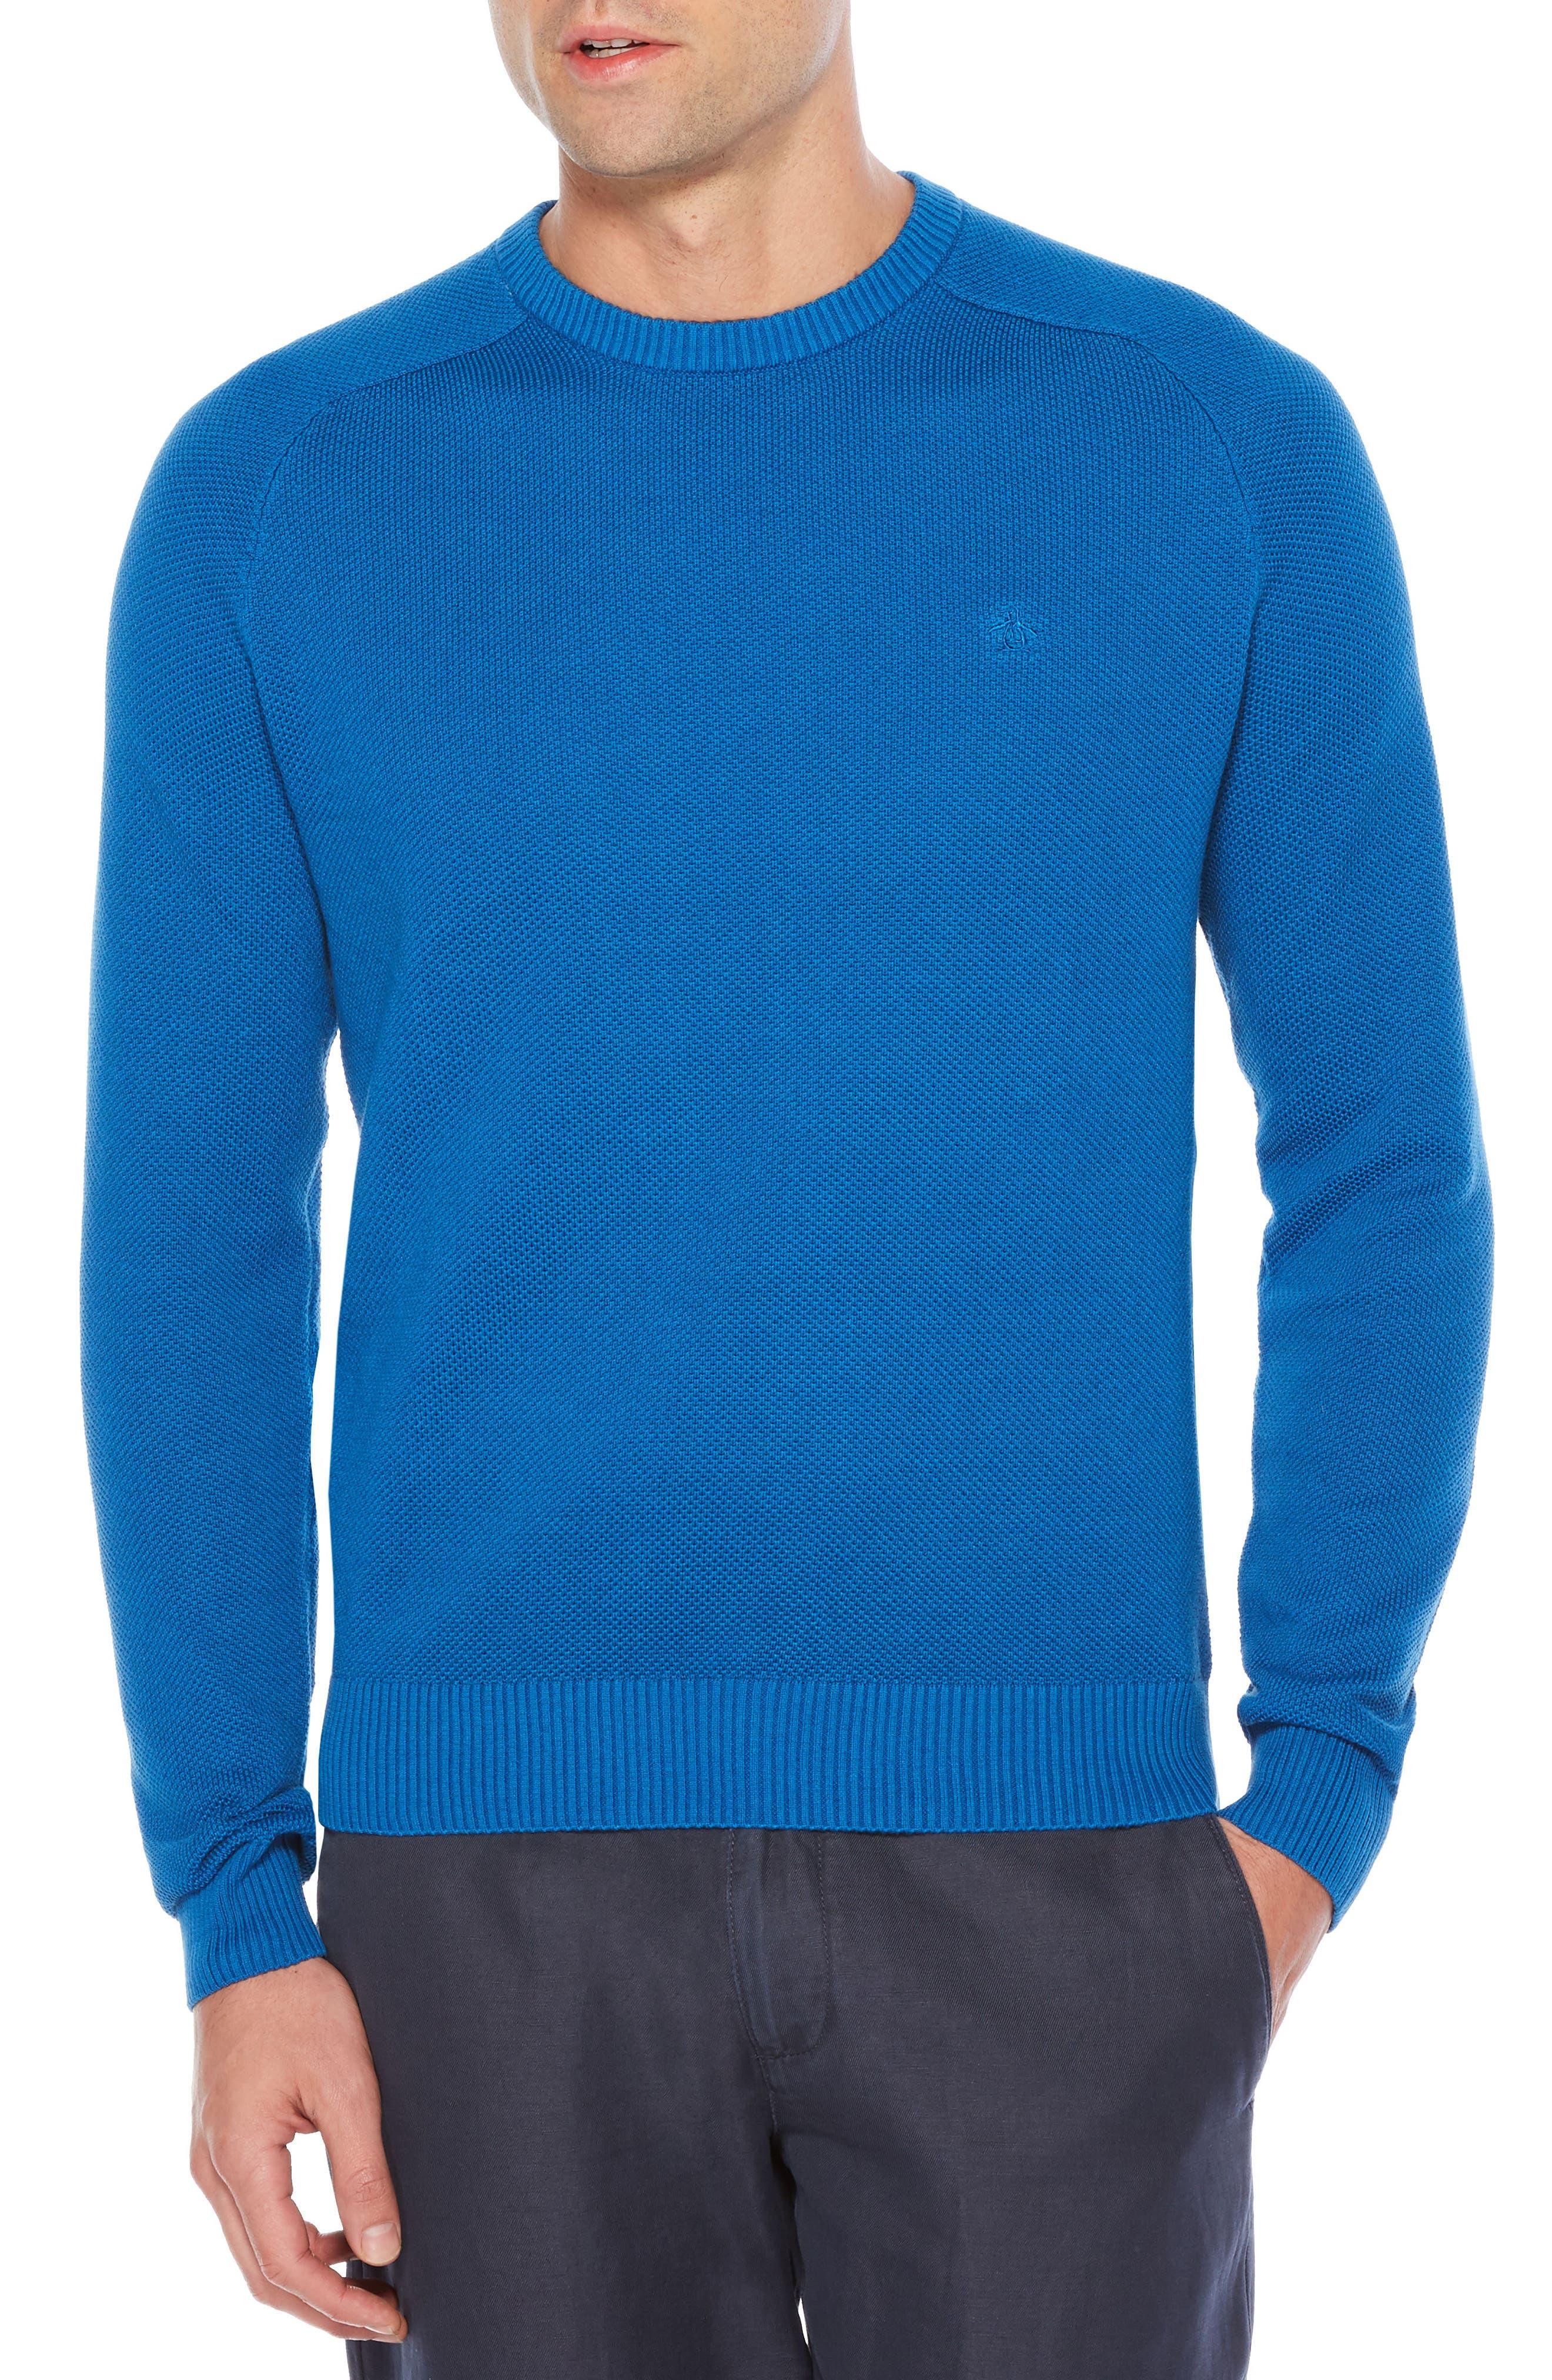 Honeycomb Piqué Sweater,                             Main thumbnail 1, color,                             403